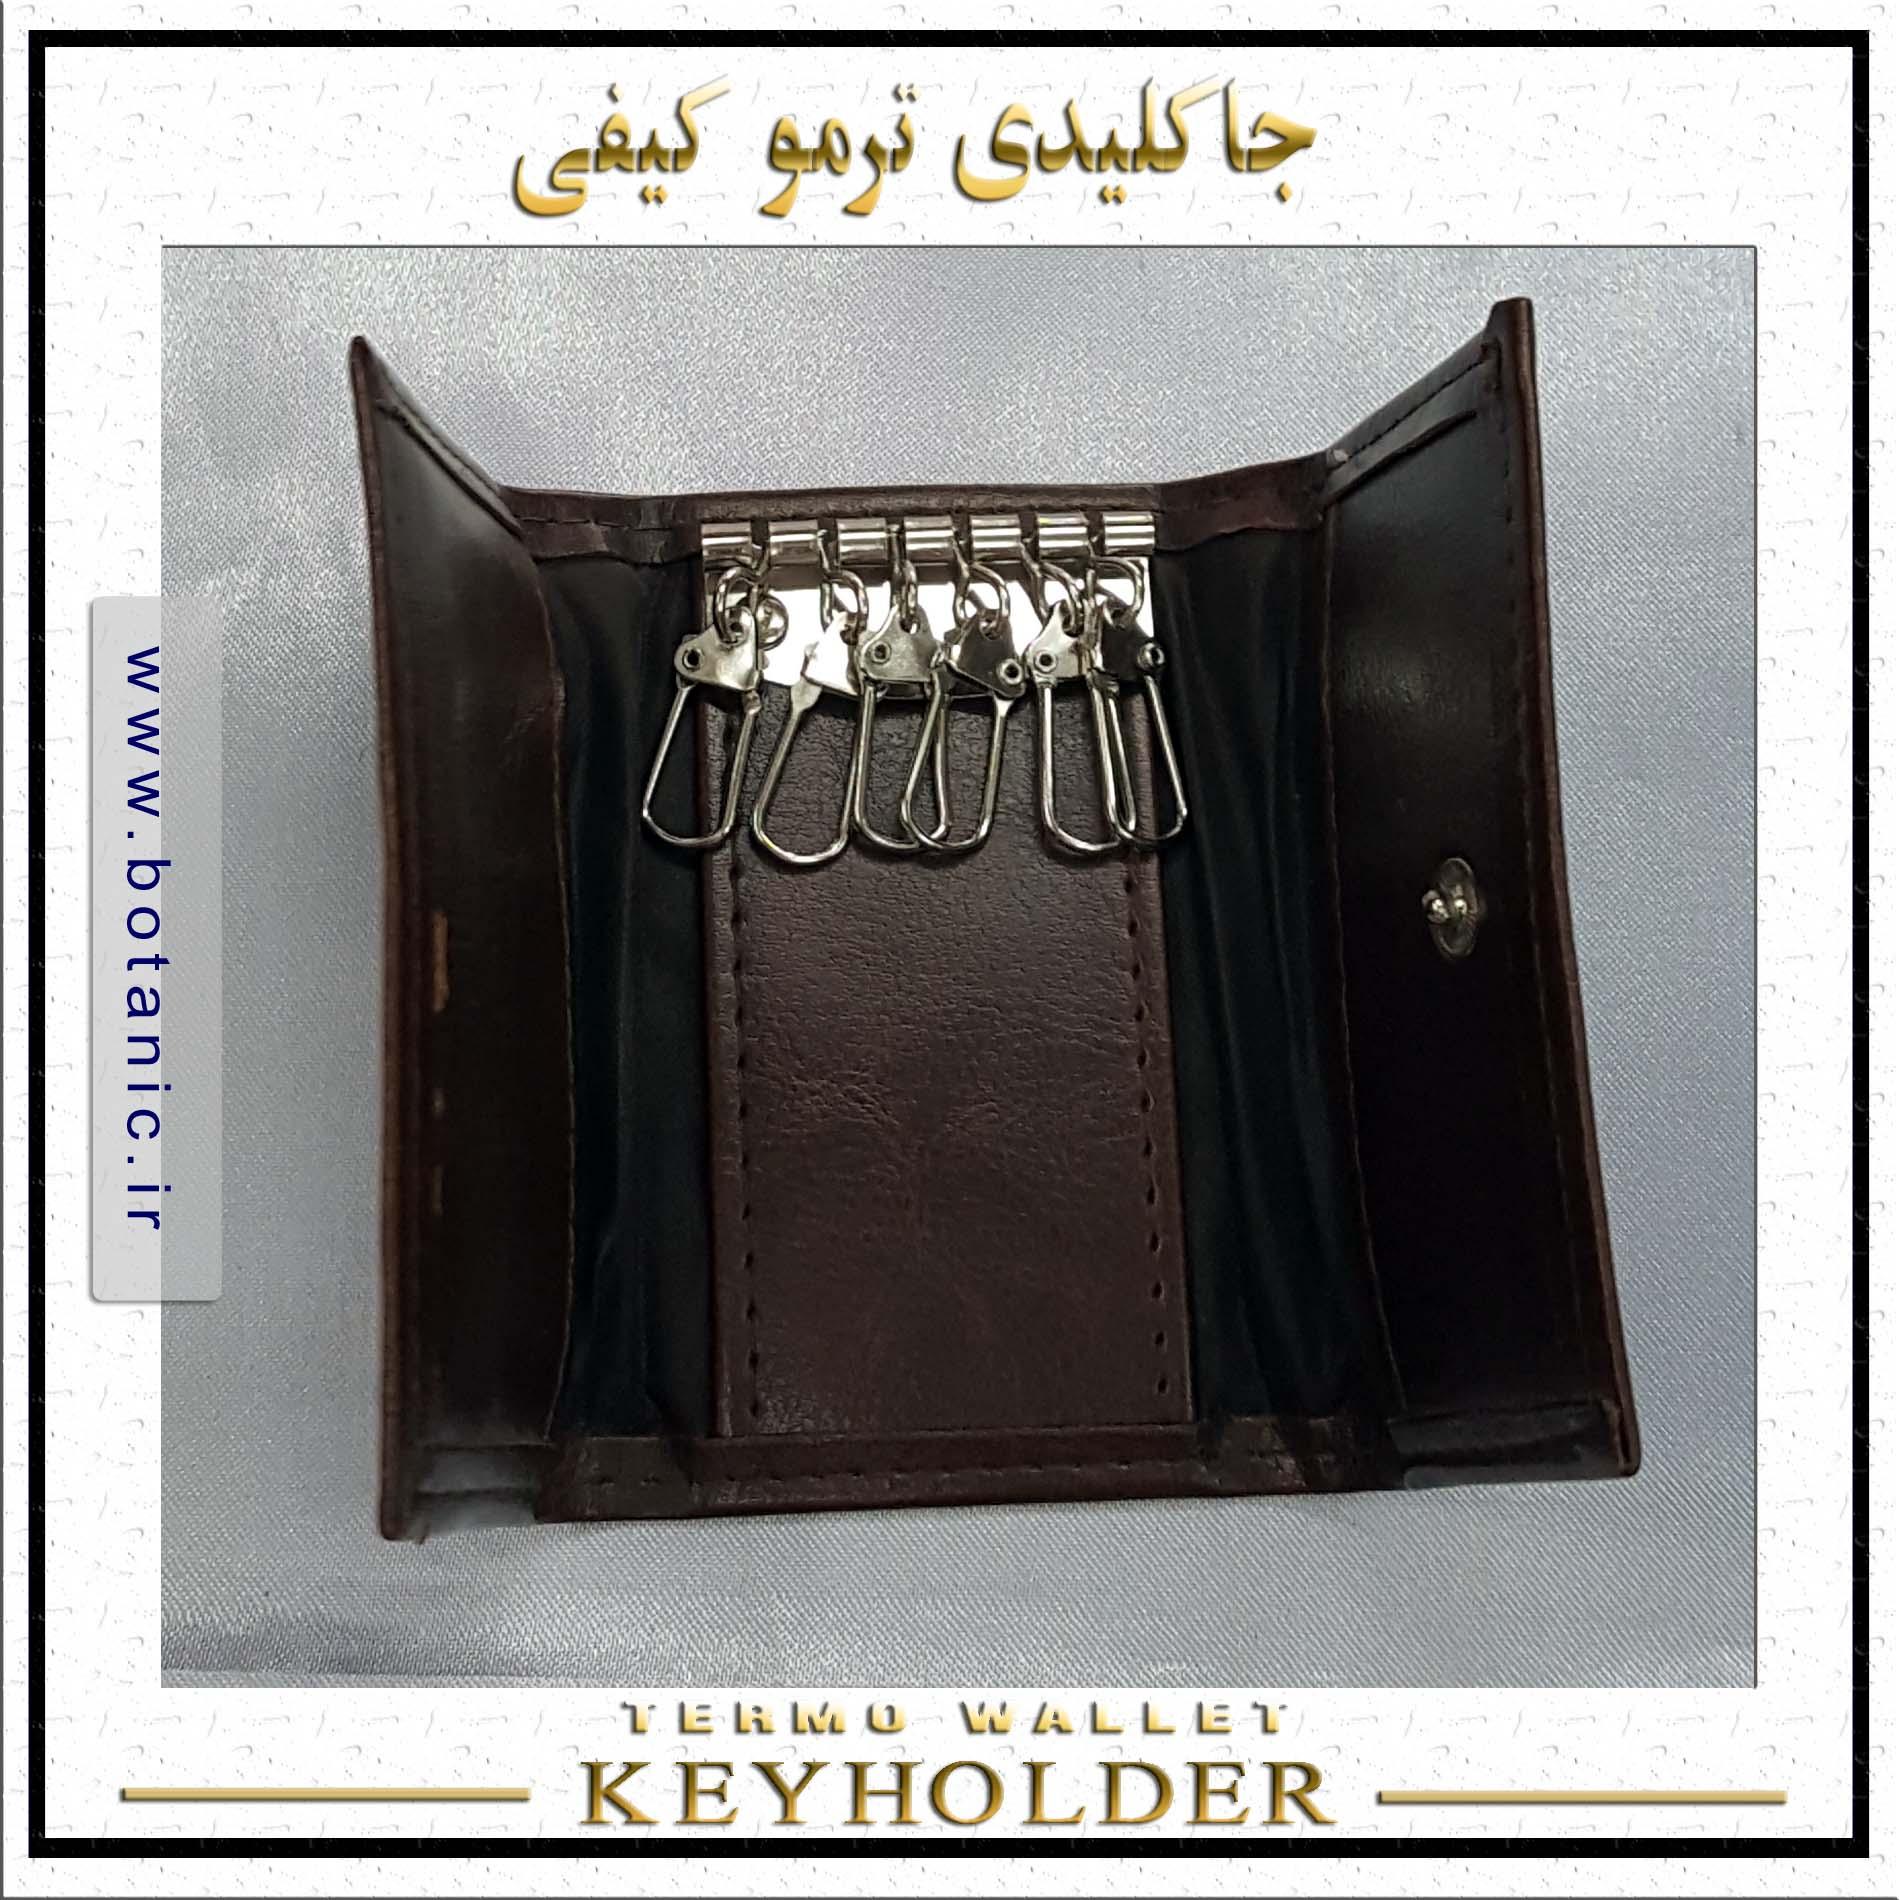 Termo Wallet Keyholder